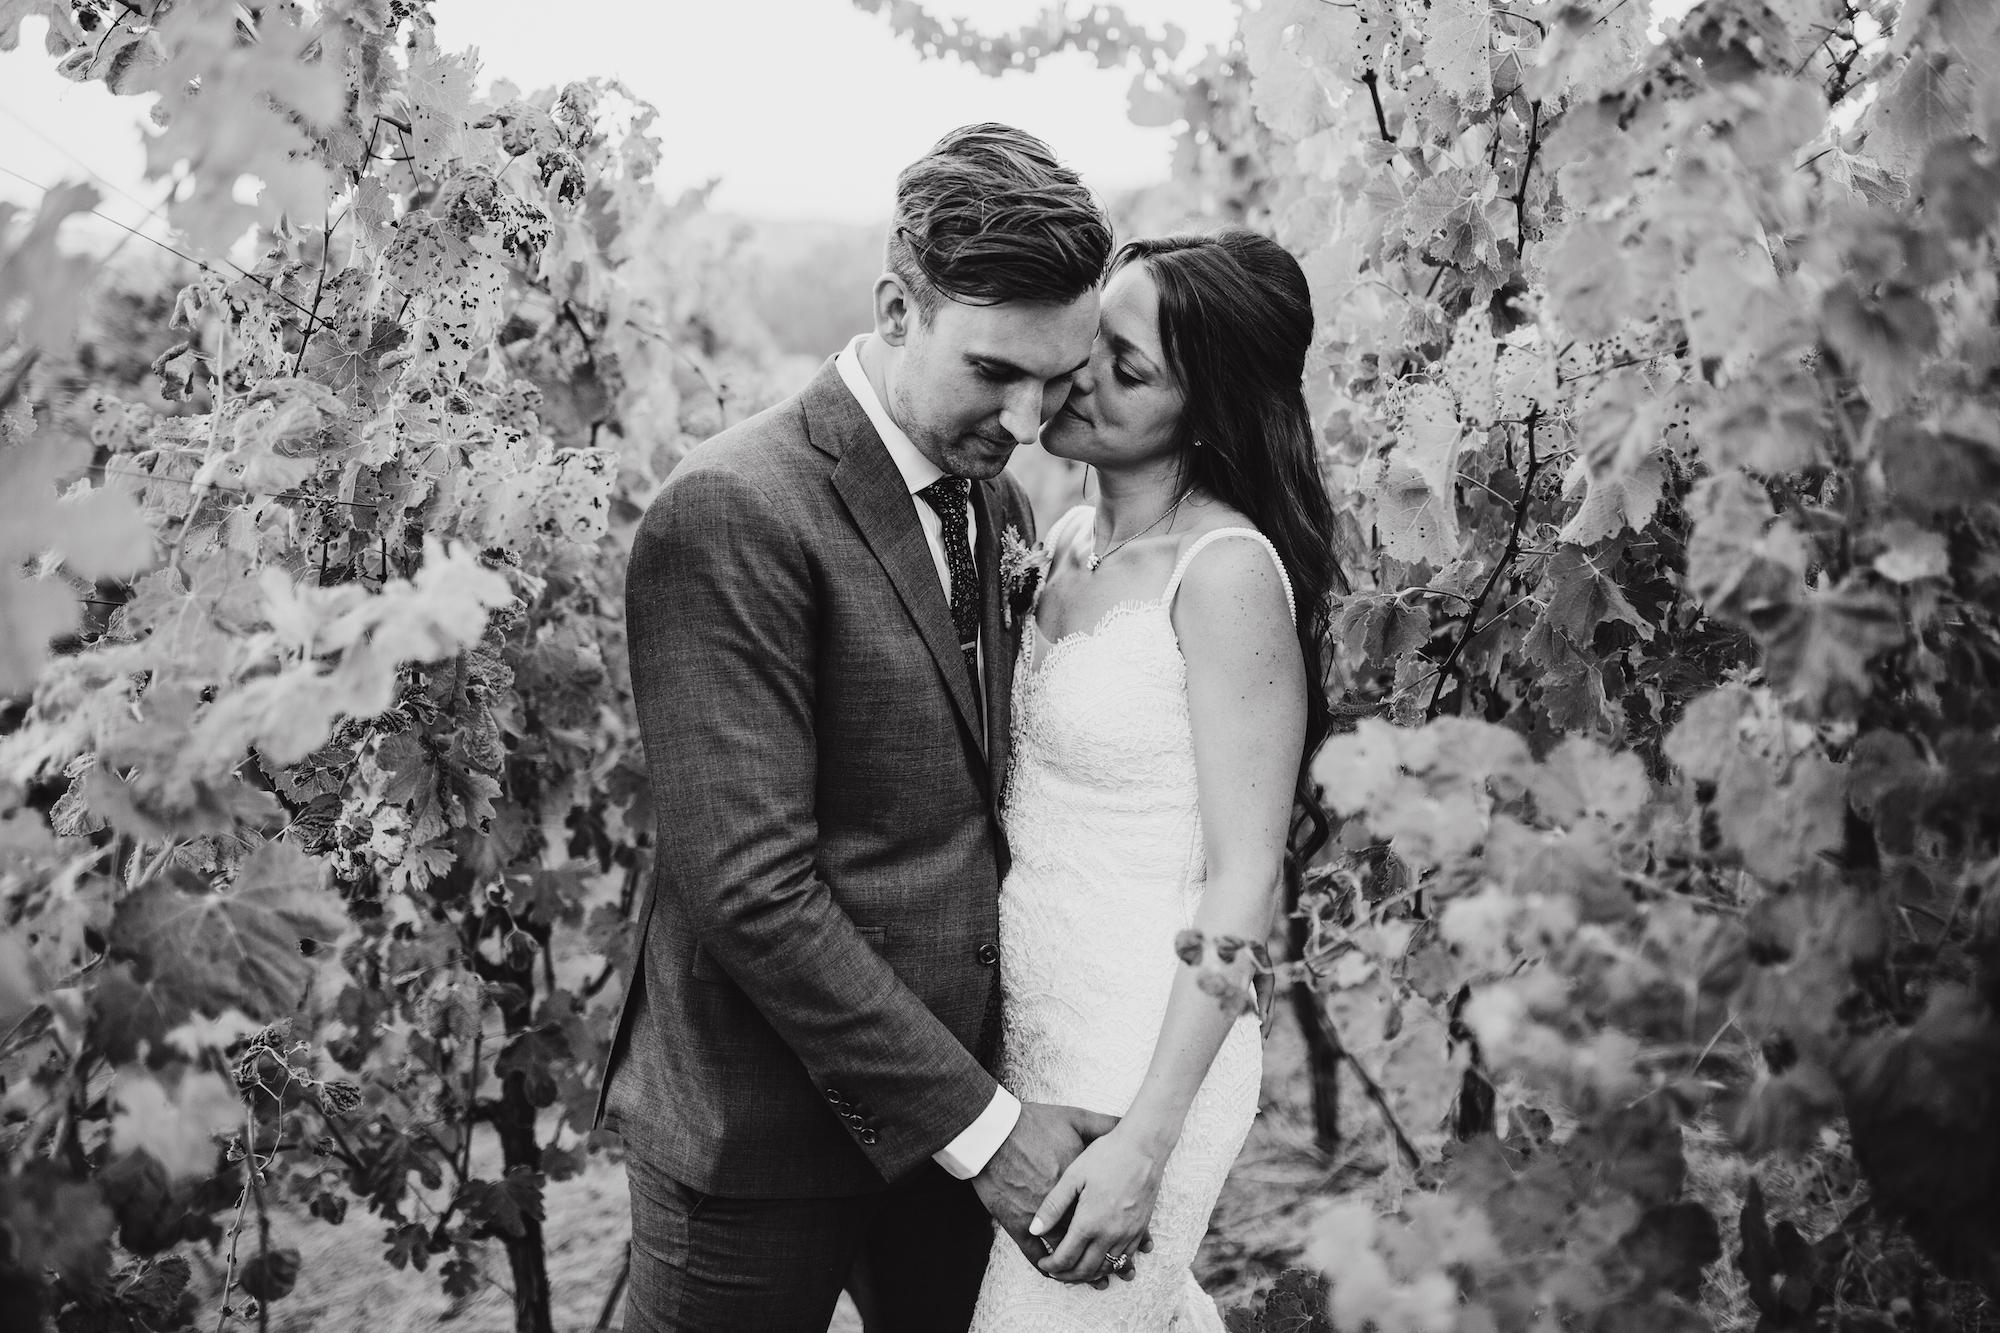 anvil-vineyards-wedding-photographer611.jpg